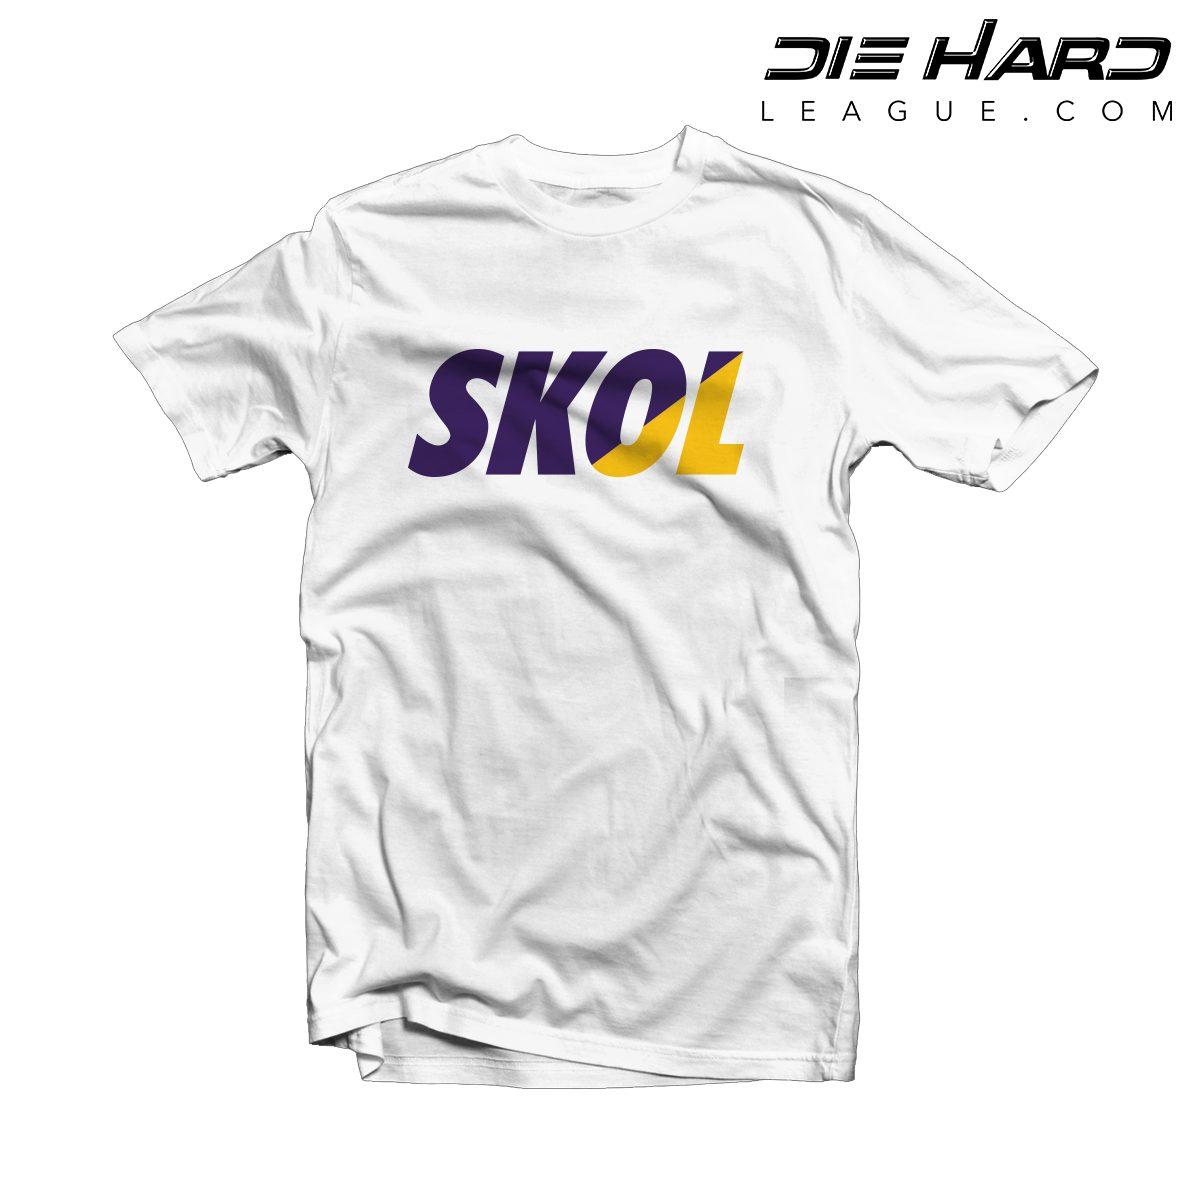 ea681c89 Viking Shirt- Minnesota Vikings SKOL White Tee